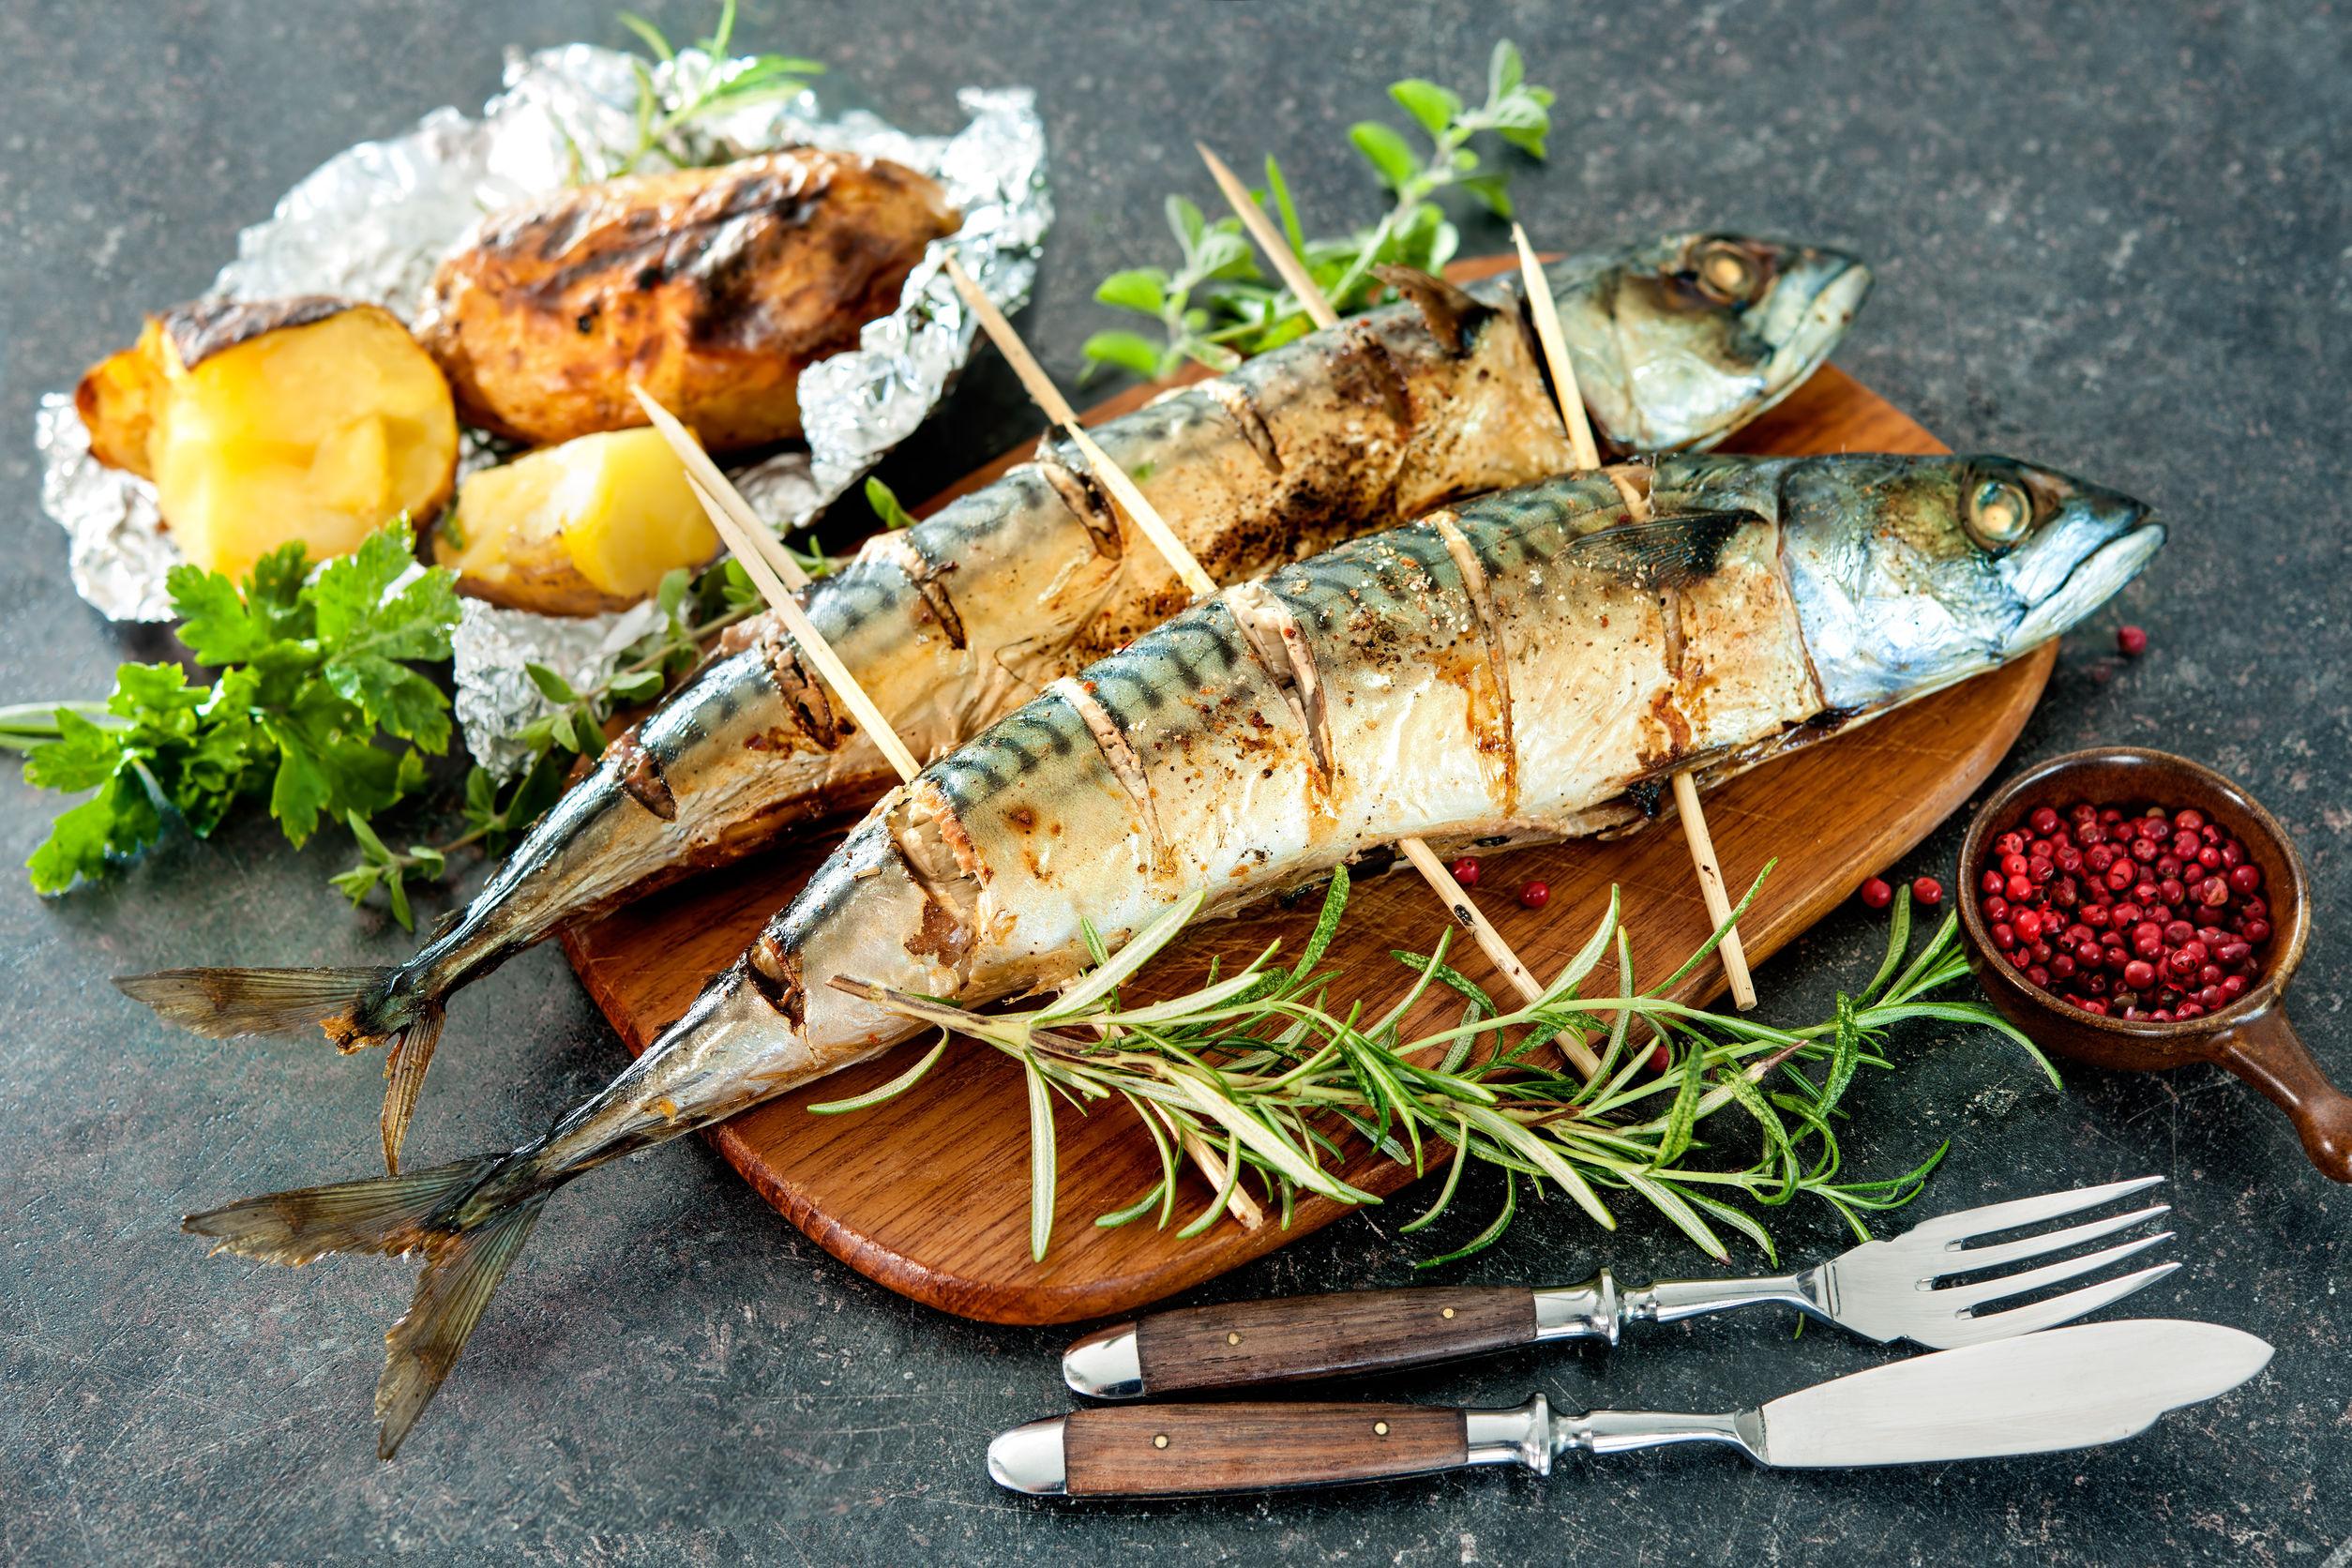 Grilovaná makrela s cesnakom, petržlenovou vňaťkou a letným šalátom